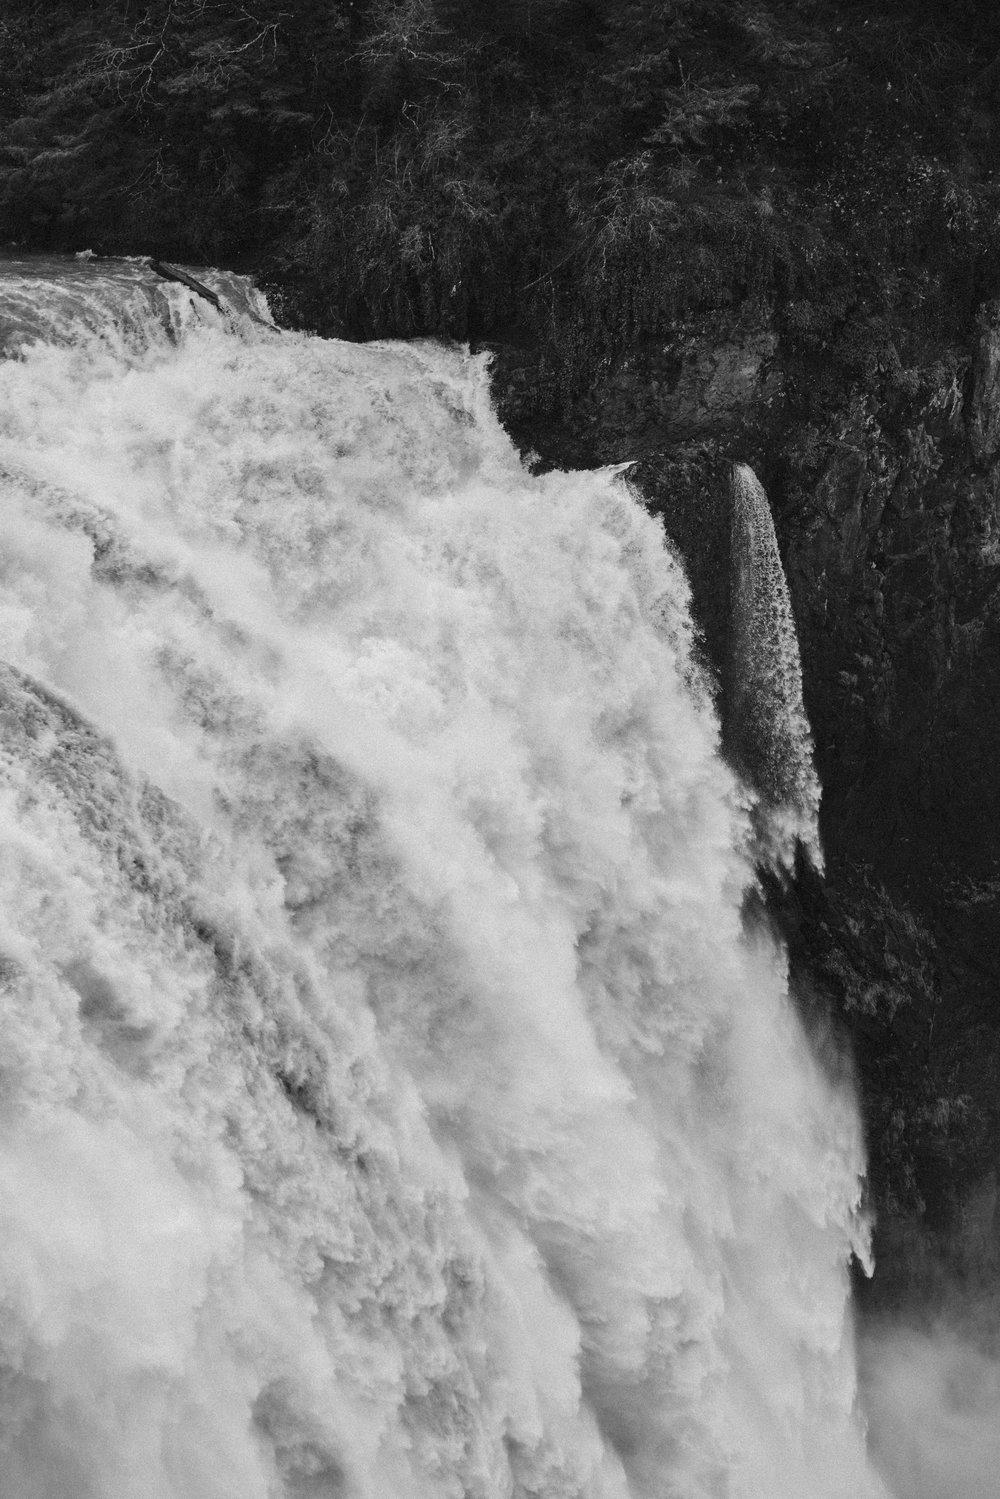 Snoqualmie Falls, WA USA